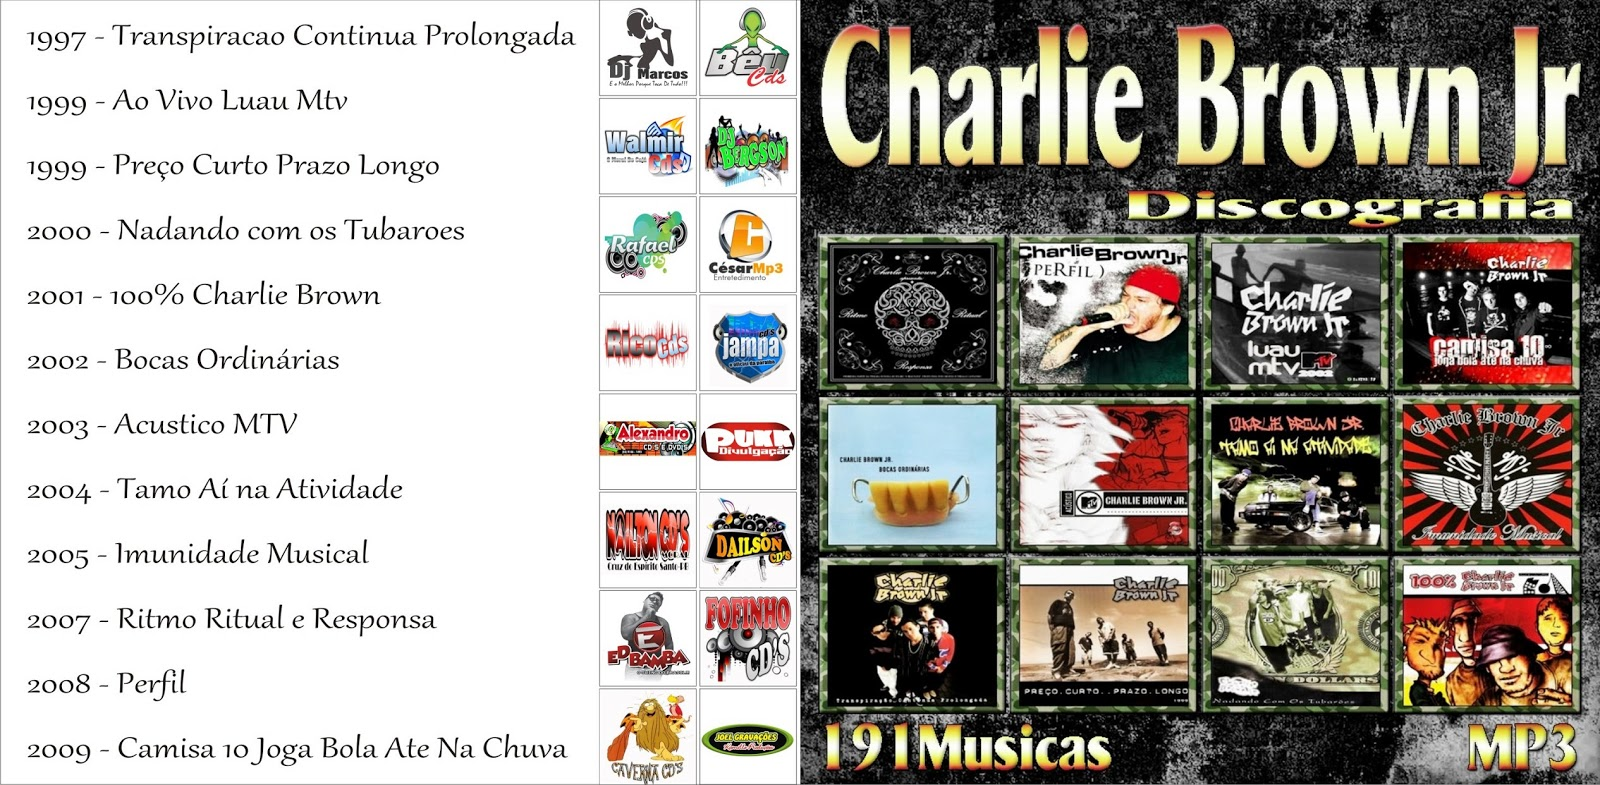 Download Cd 2007 - Ritmo Ritual e Responsa